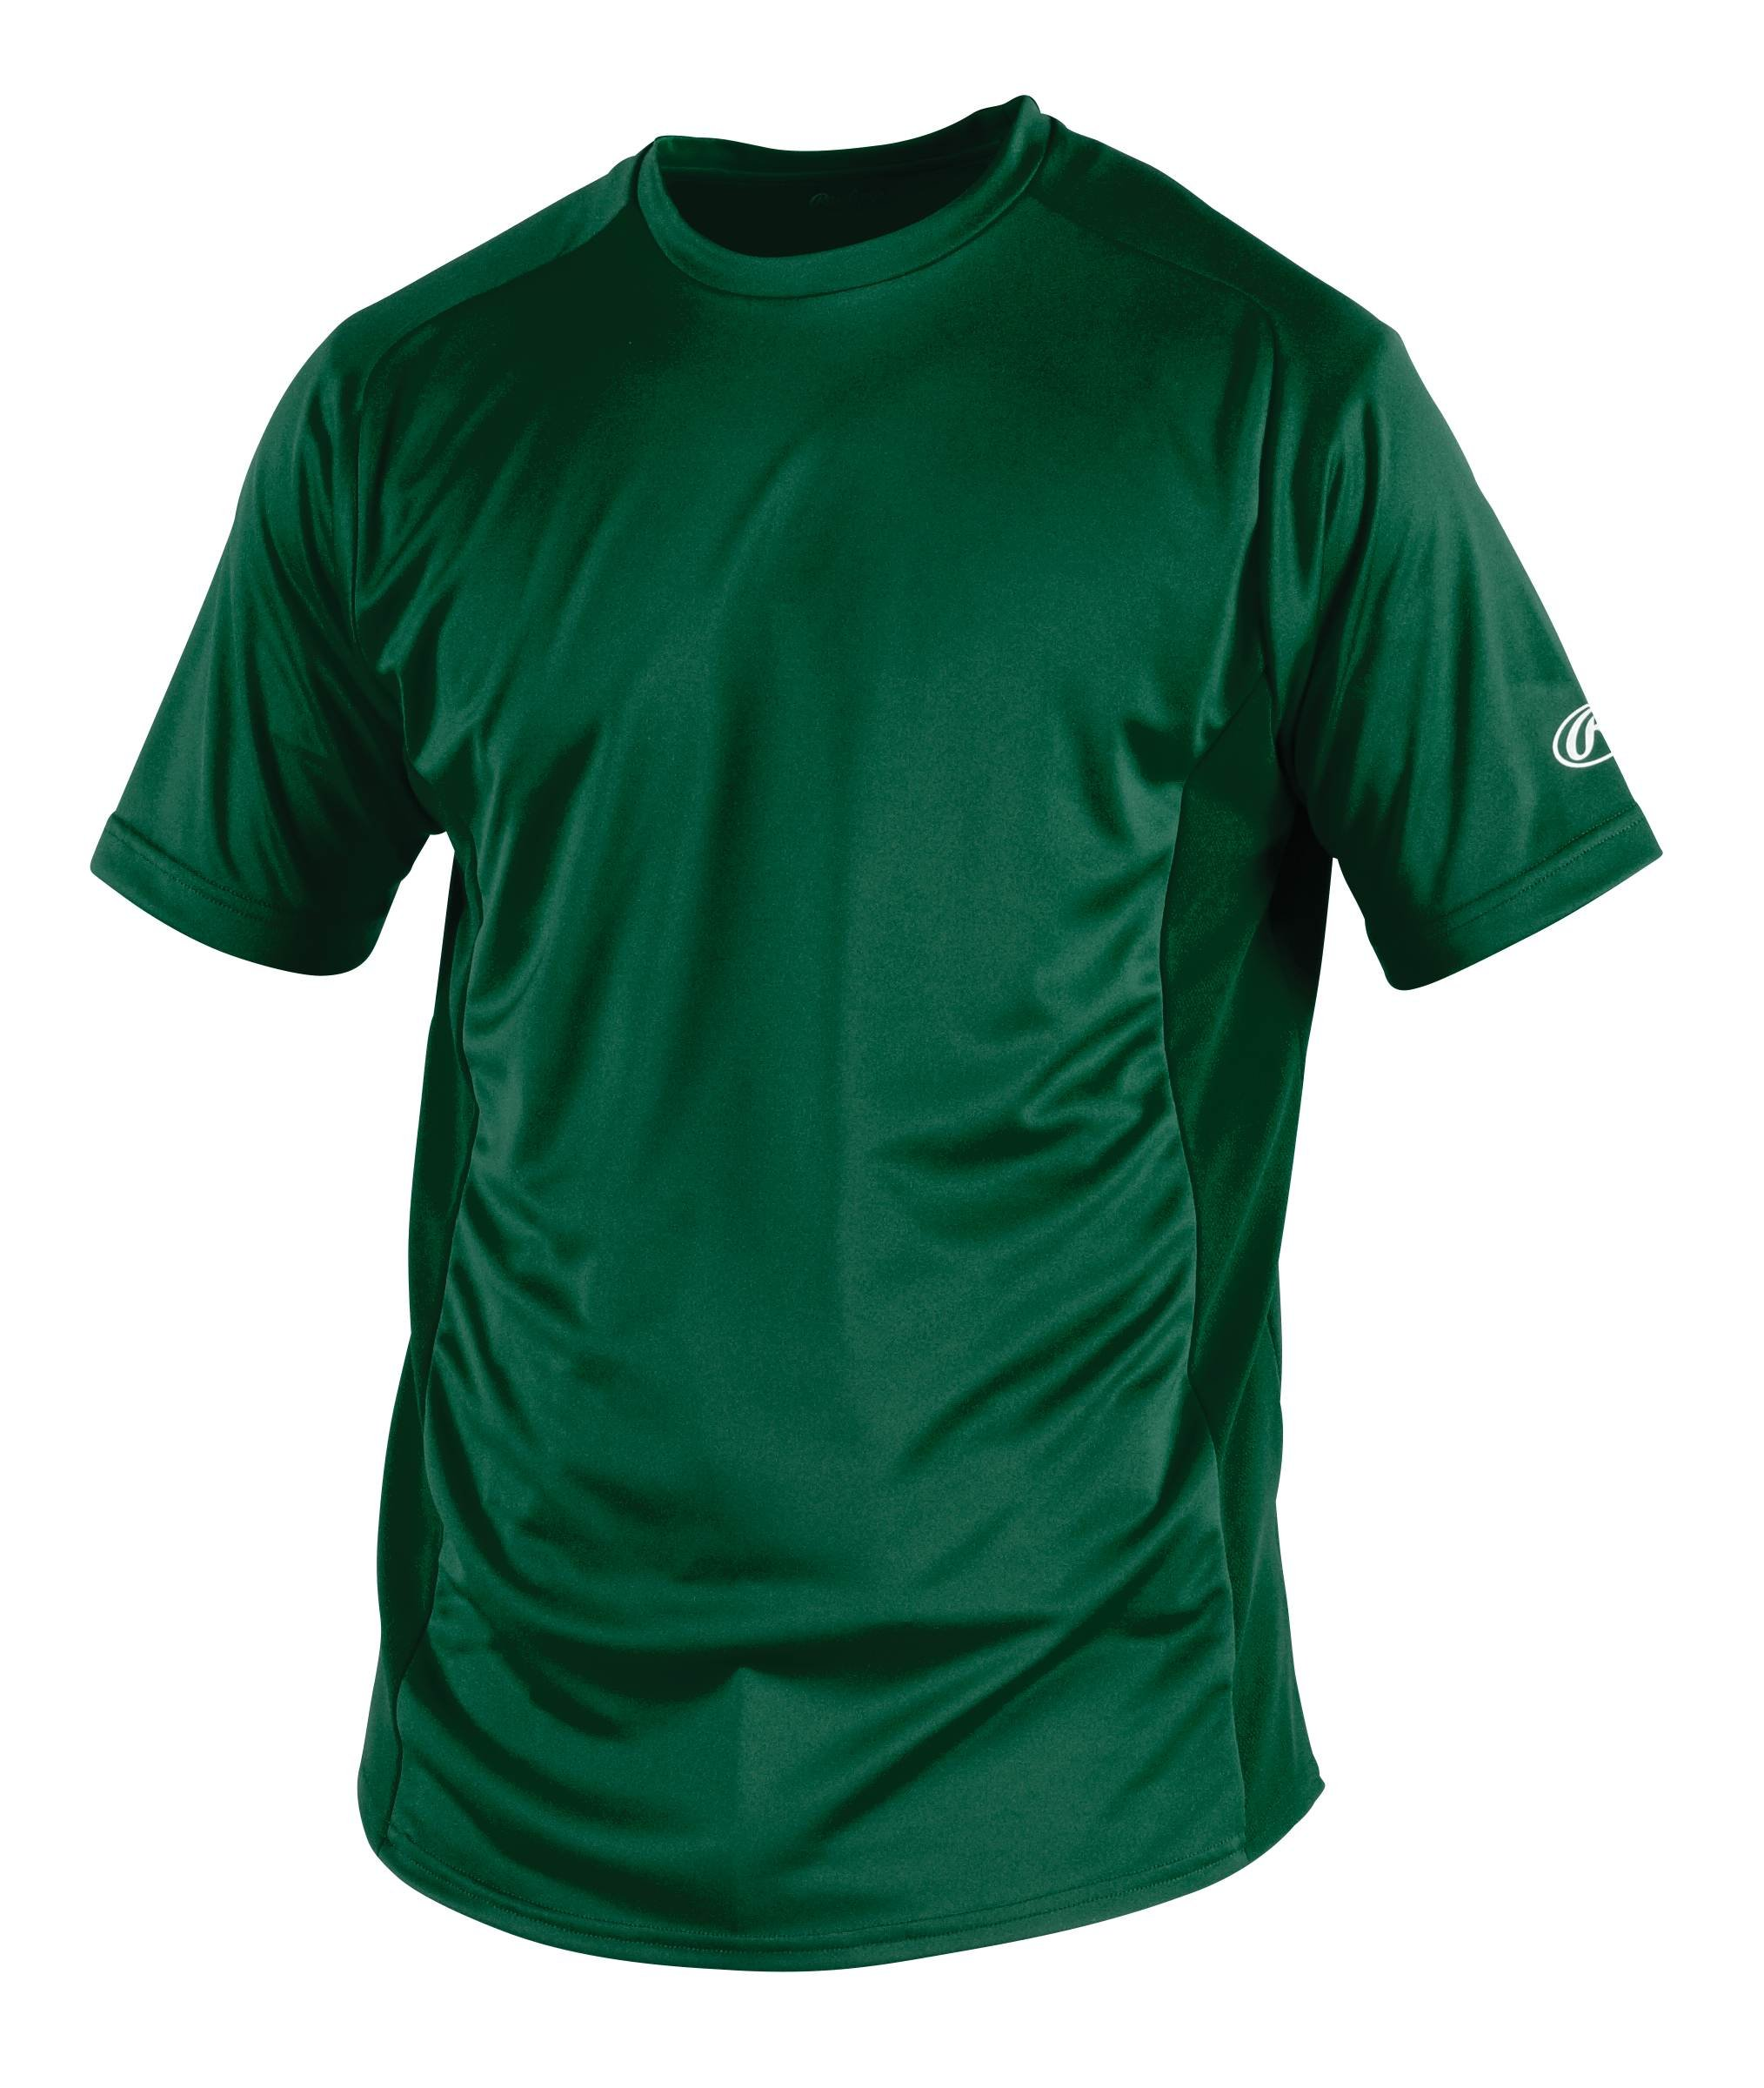 Rawlings Men's Short Sleeve Baselayer Shirt, Dark